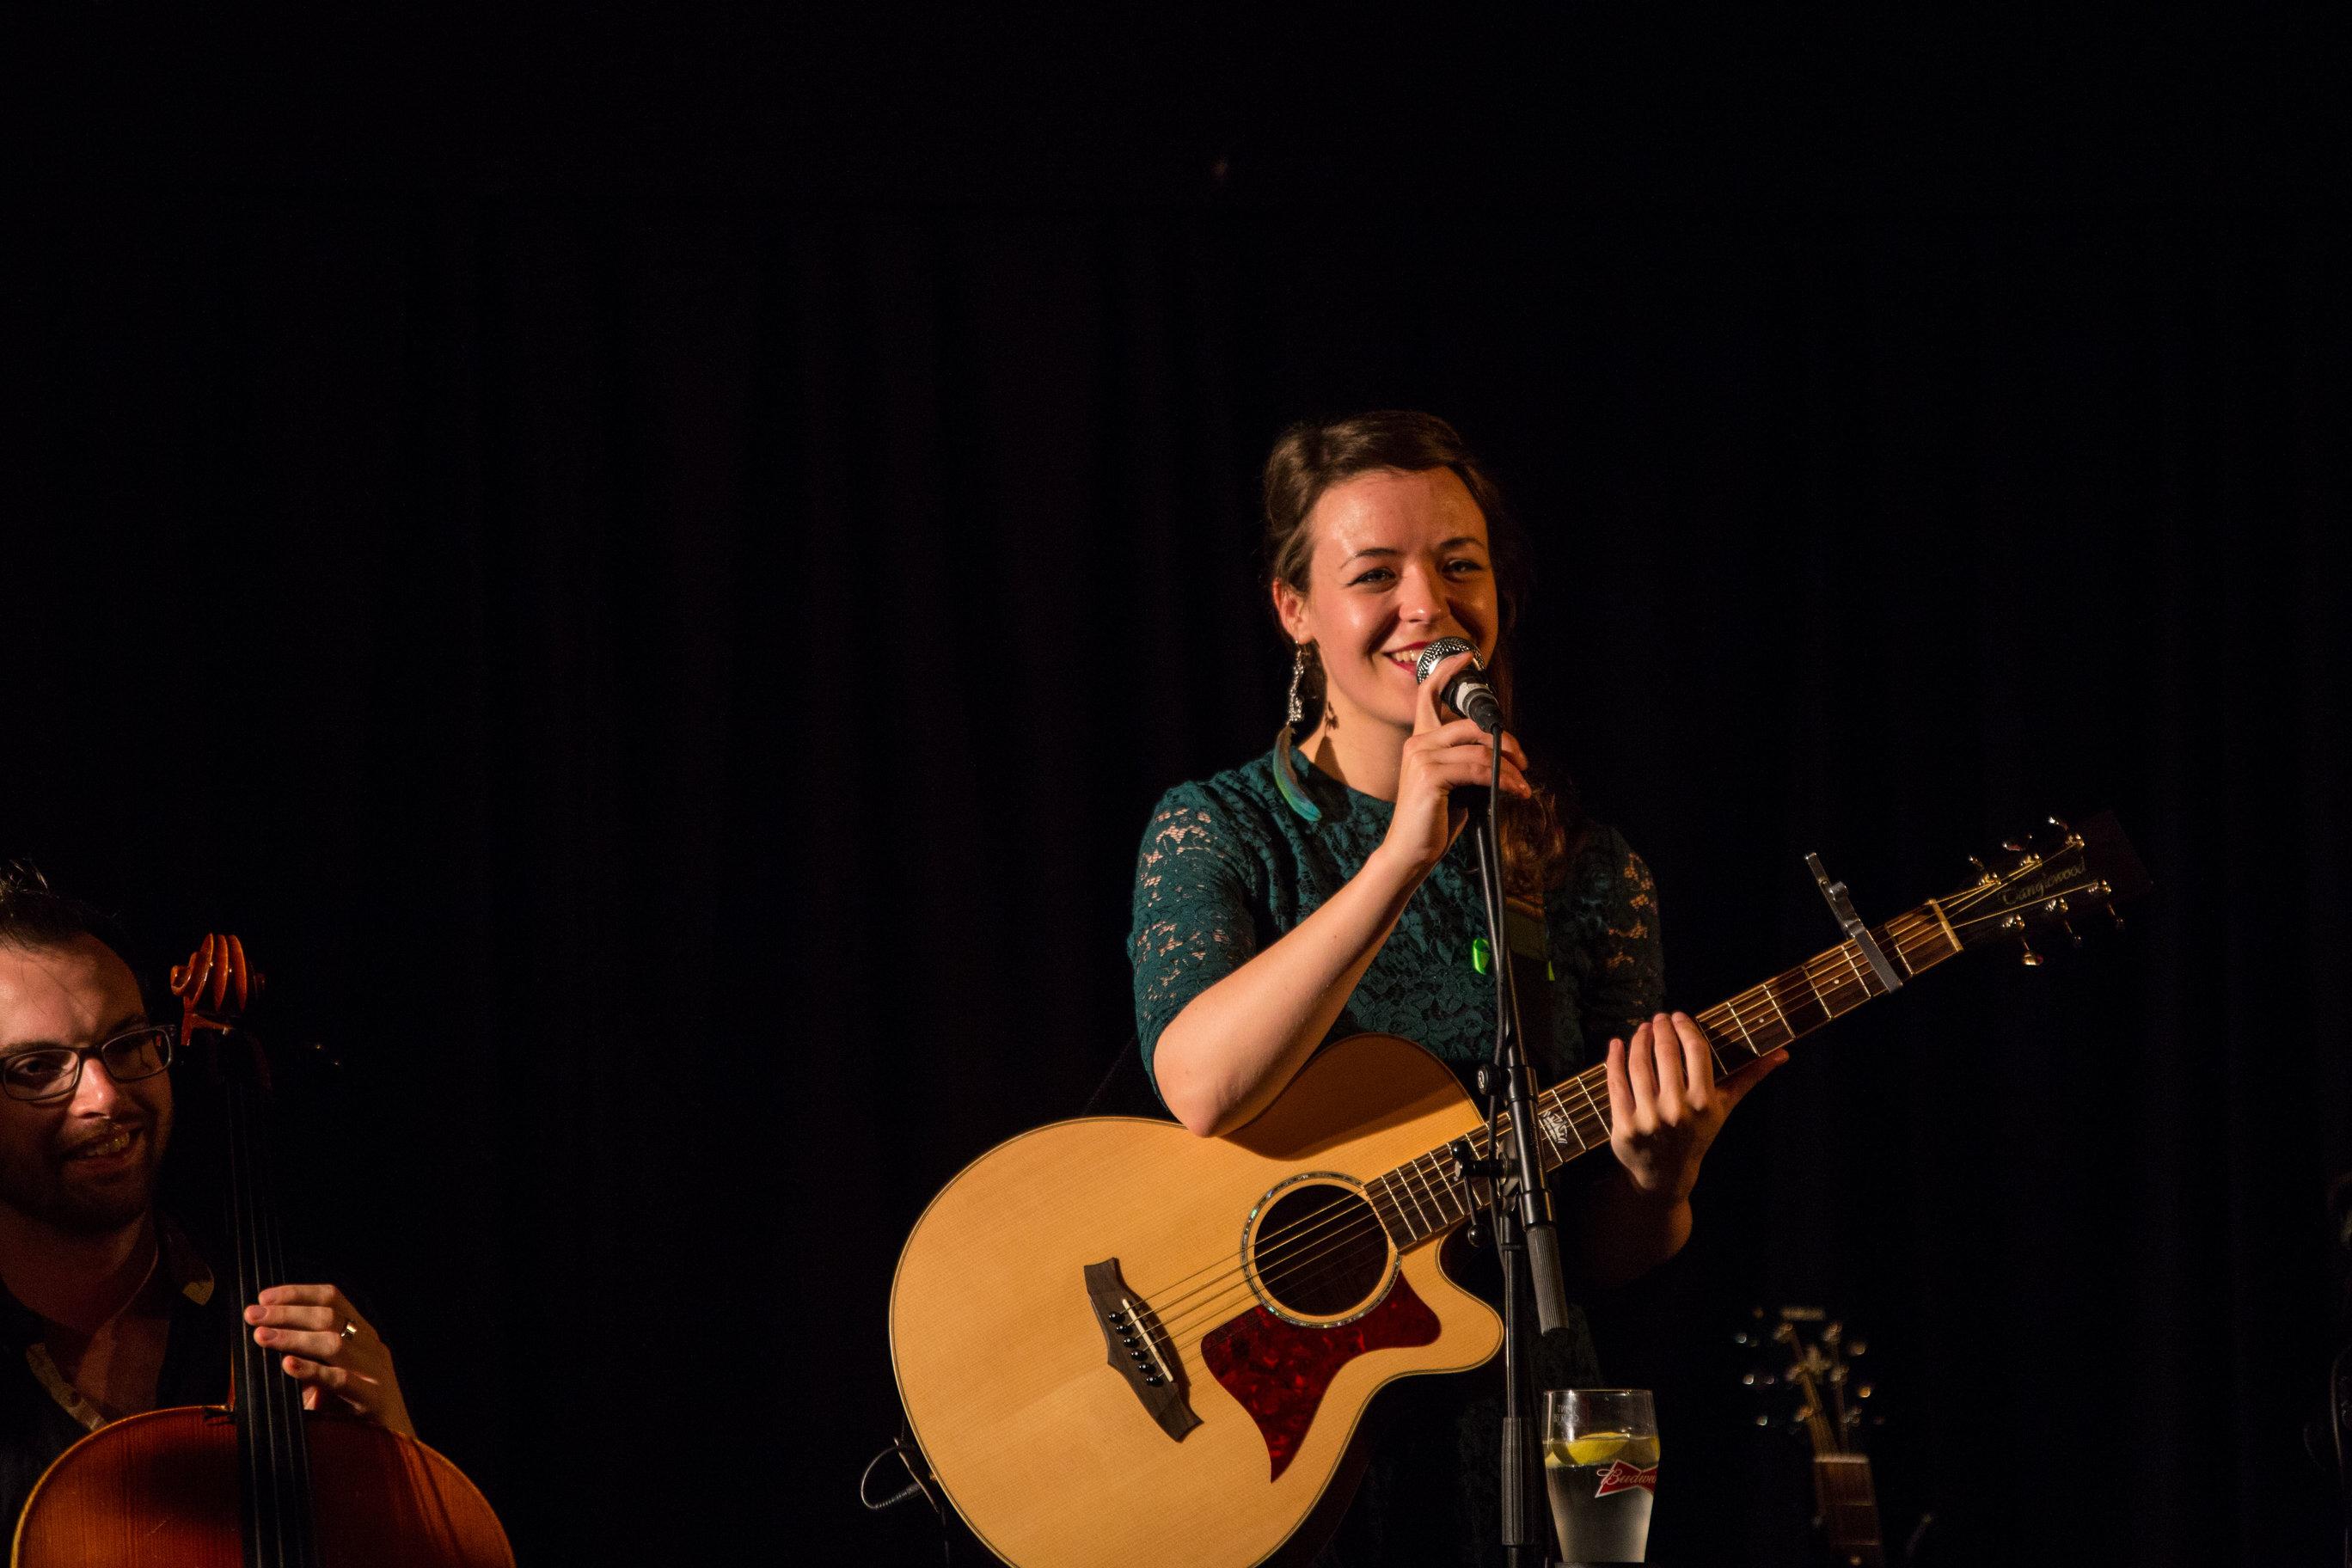 Emma Langford debuts EP at Dolans Limerick. Picture by Cian Reinhardt/ilovelimerick